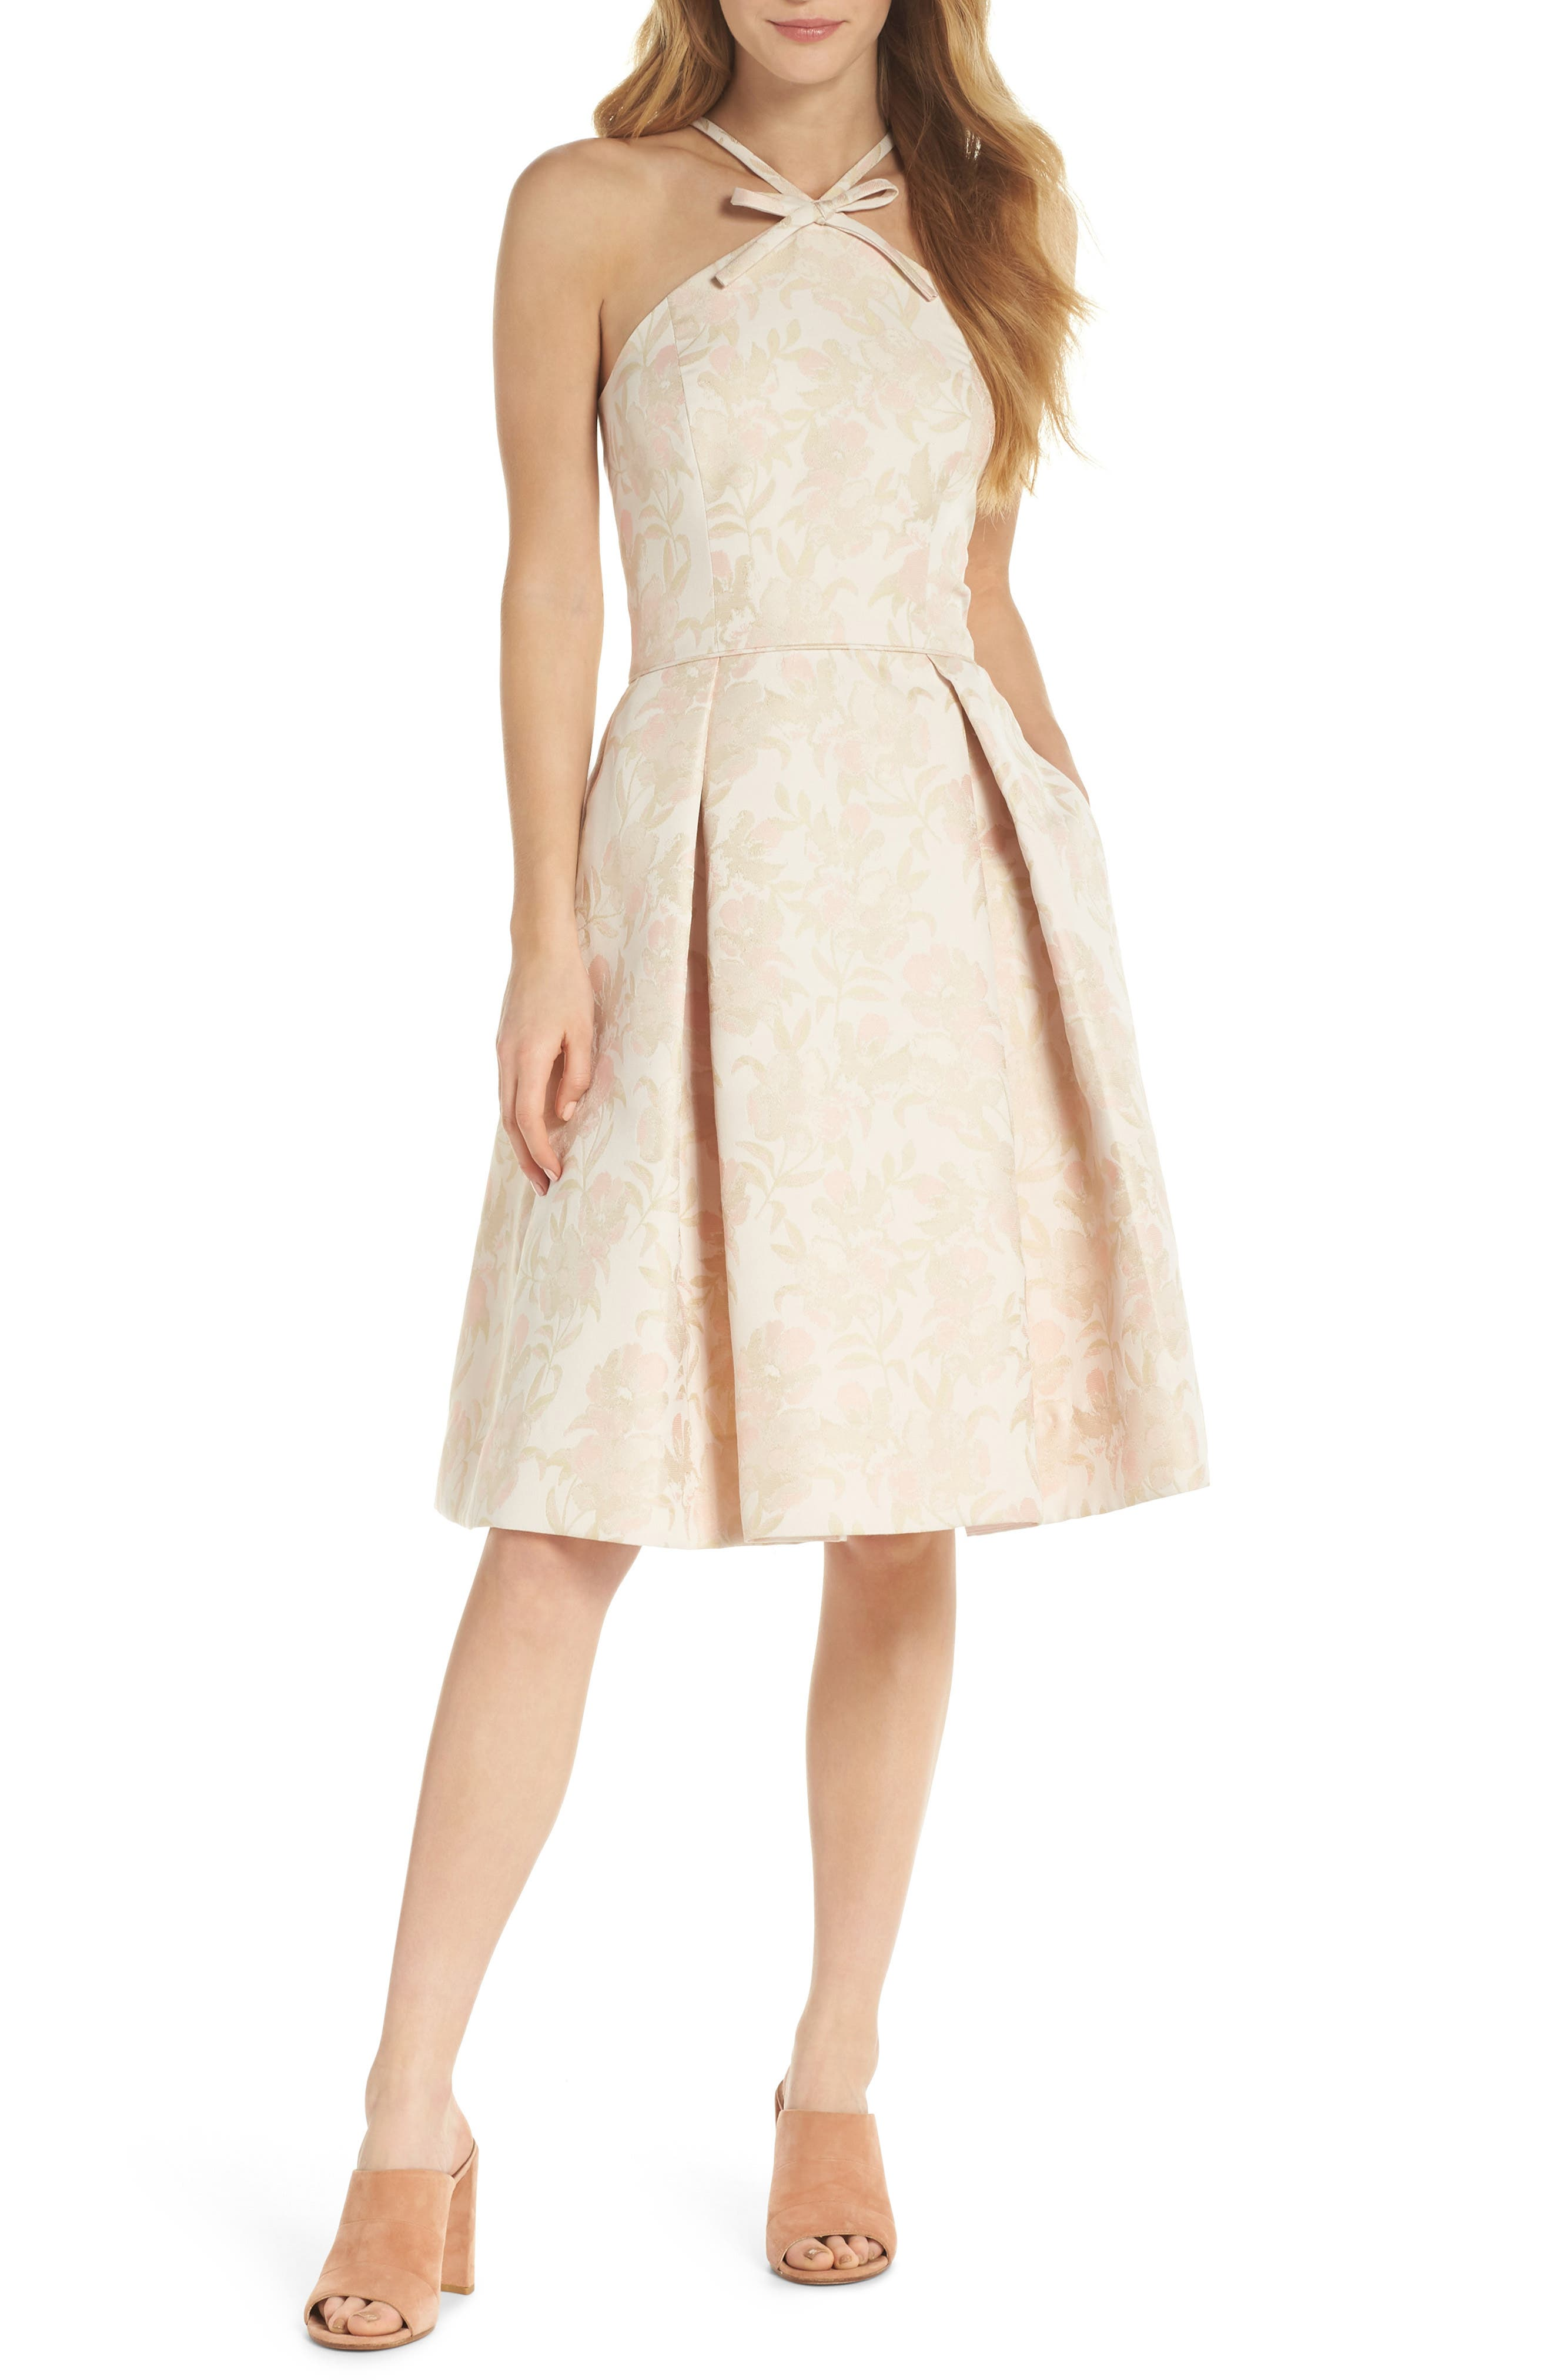 Evelyn Sea Holly Jacquard Halter Dress,                             Main thumbnail 1, color,                             650